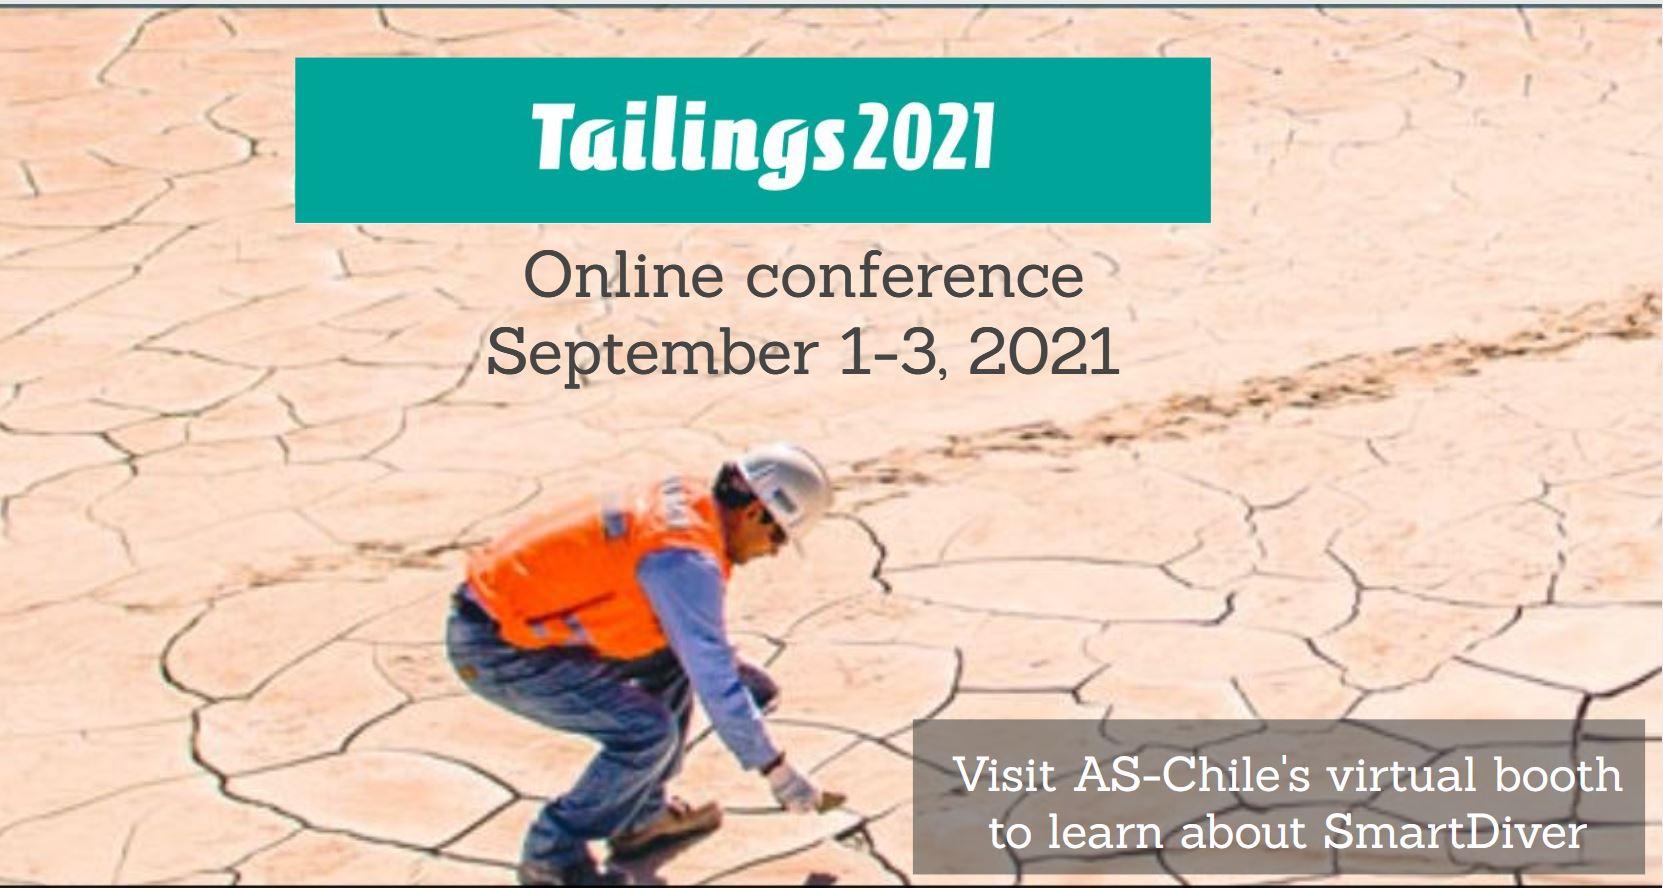 Tailings 2021